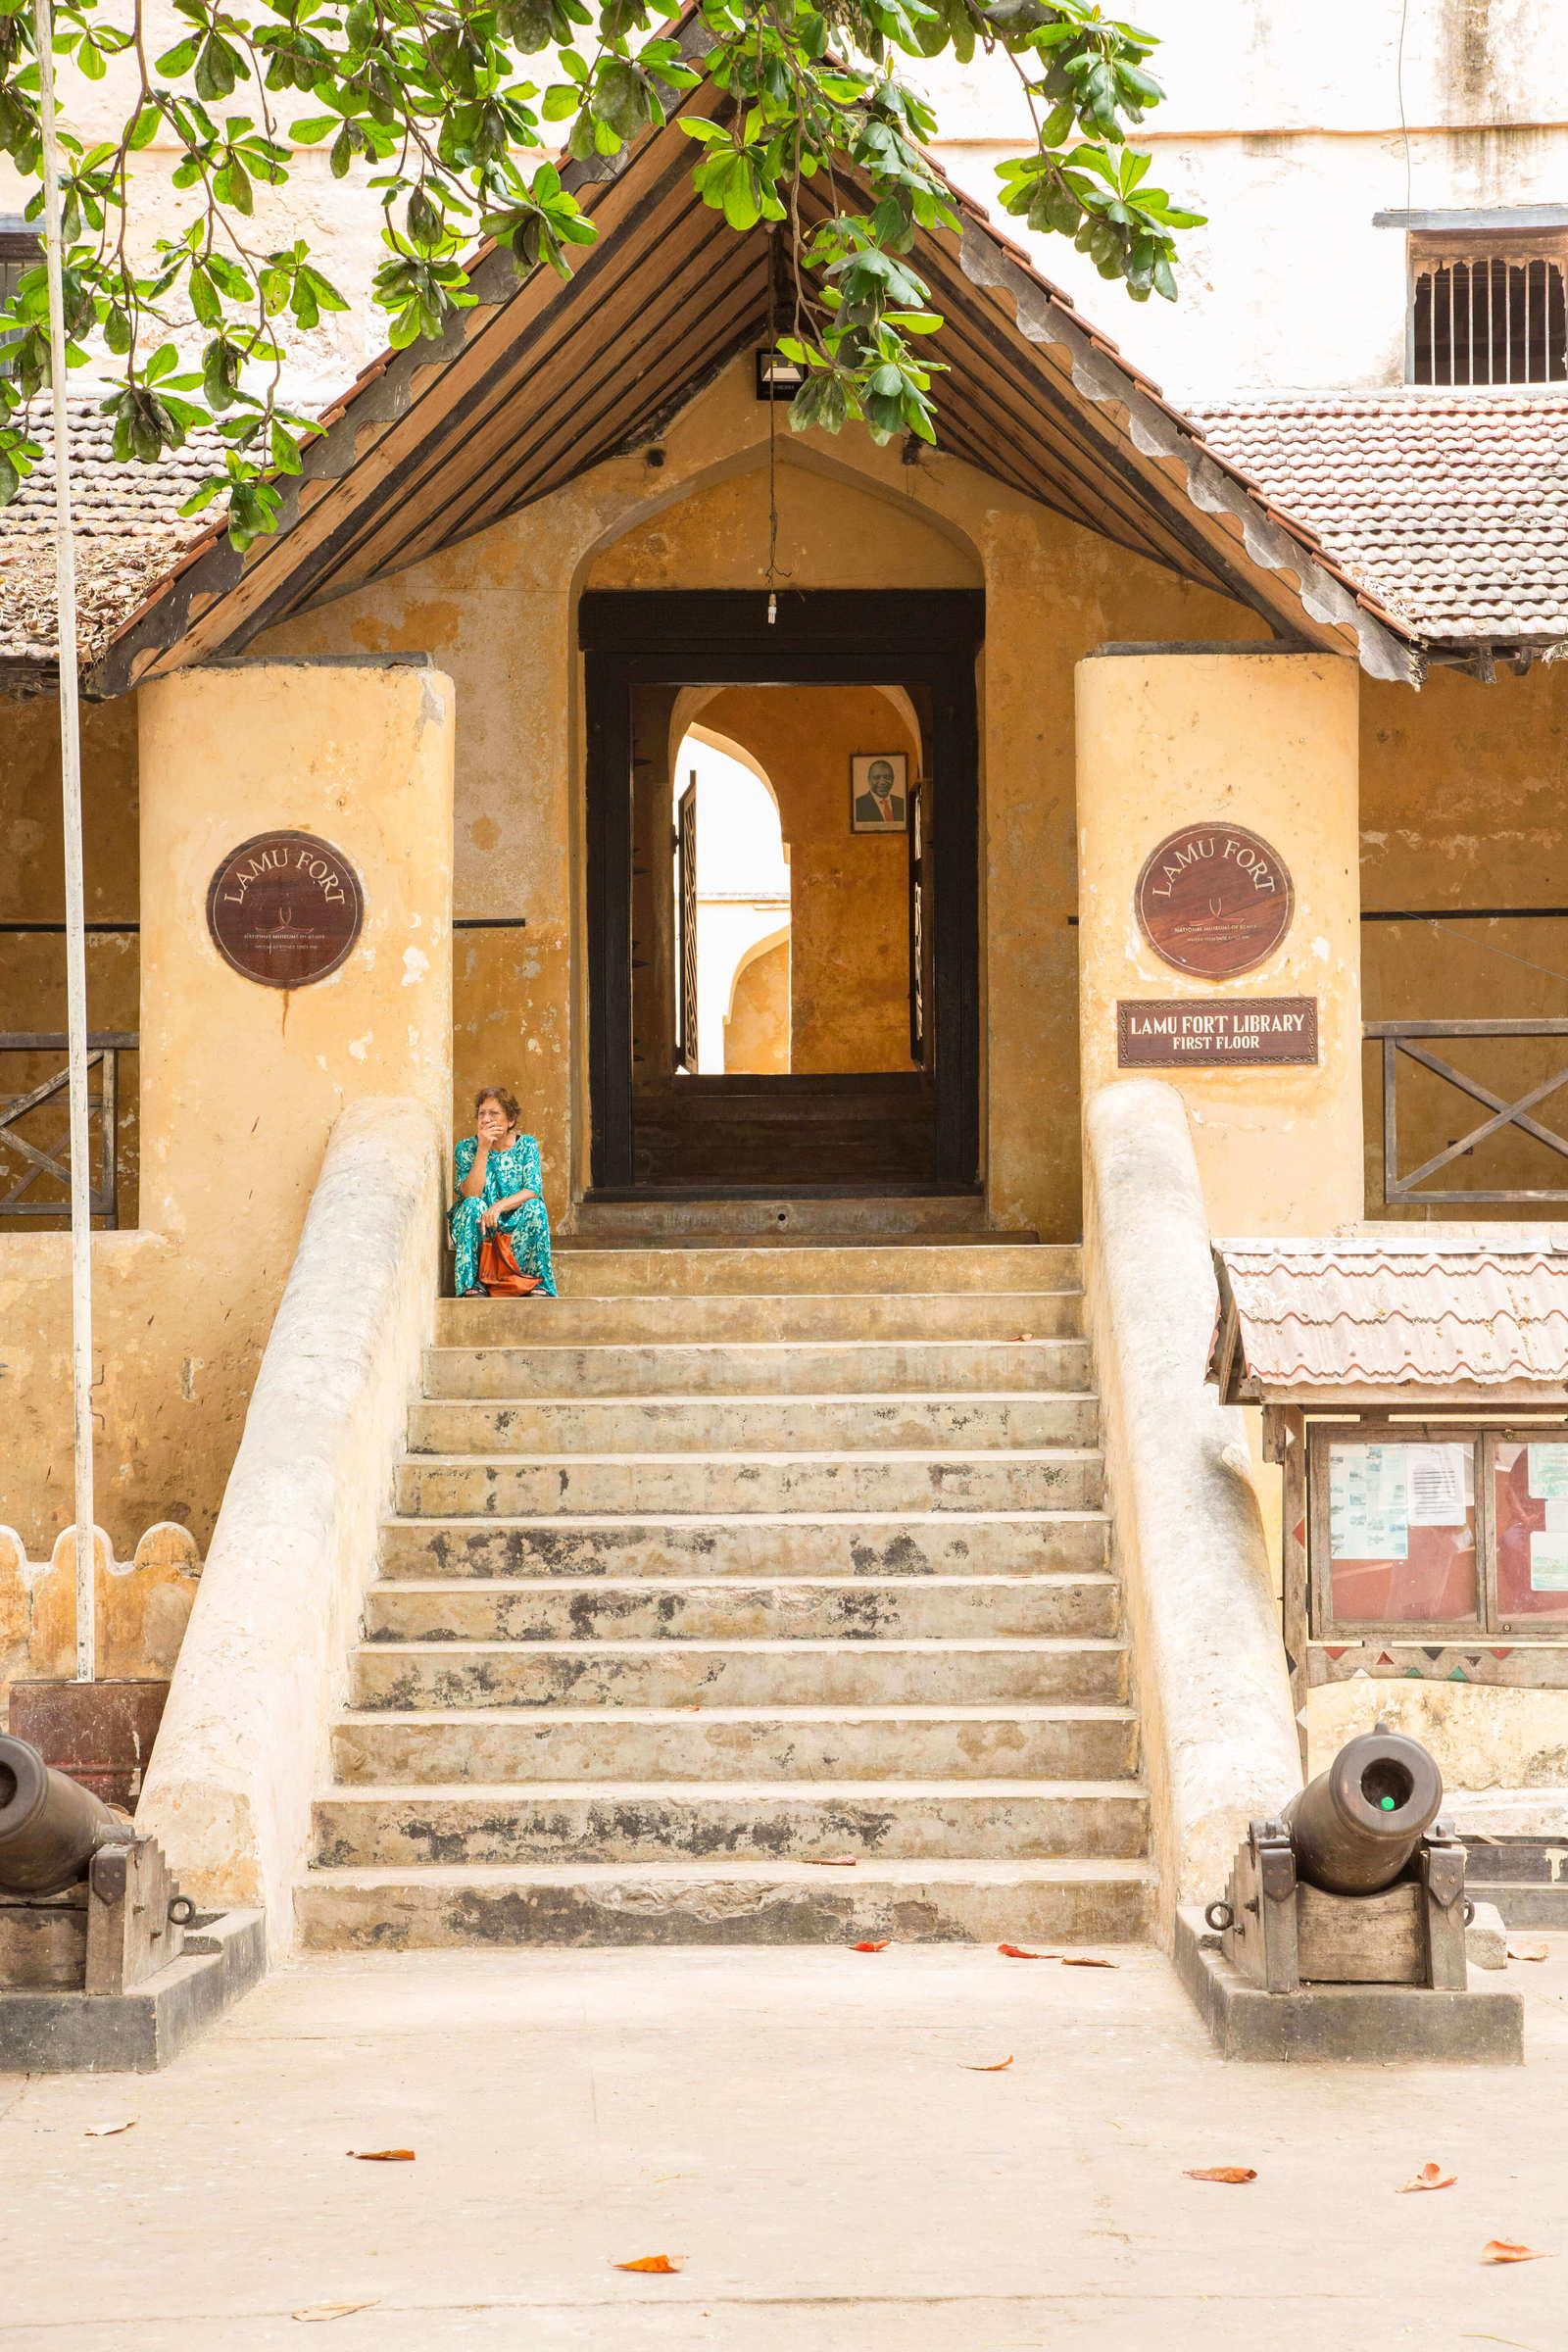 Lamu Fort Entrance in Kenya